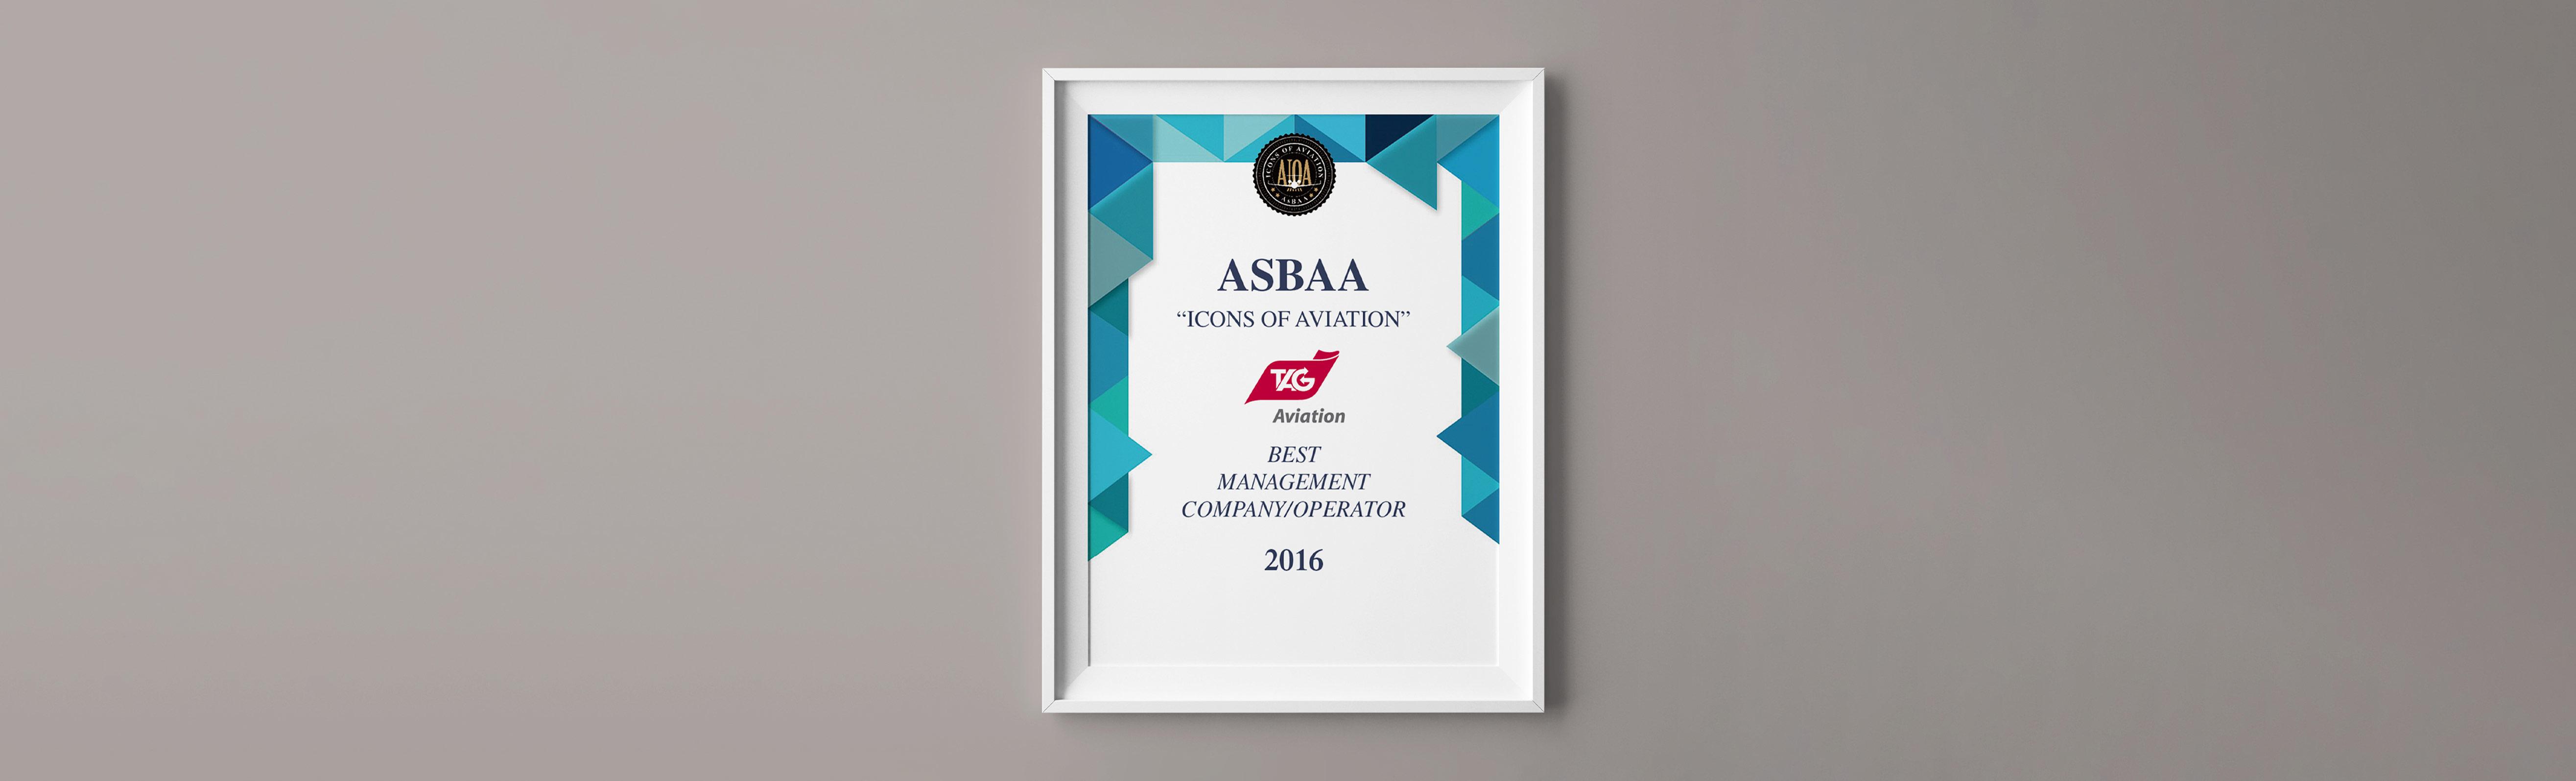 TAG航空亞洲在亞洲商務航空協會(AsBAA)的2017航空業指標頒獎典禮中贏得最佳管理公司/營運商獎項